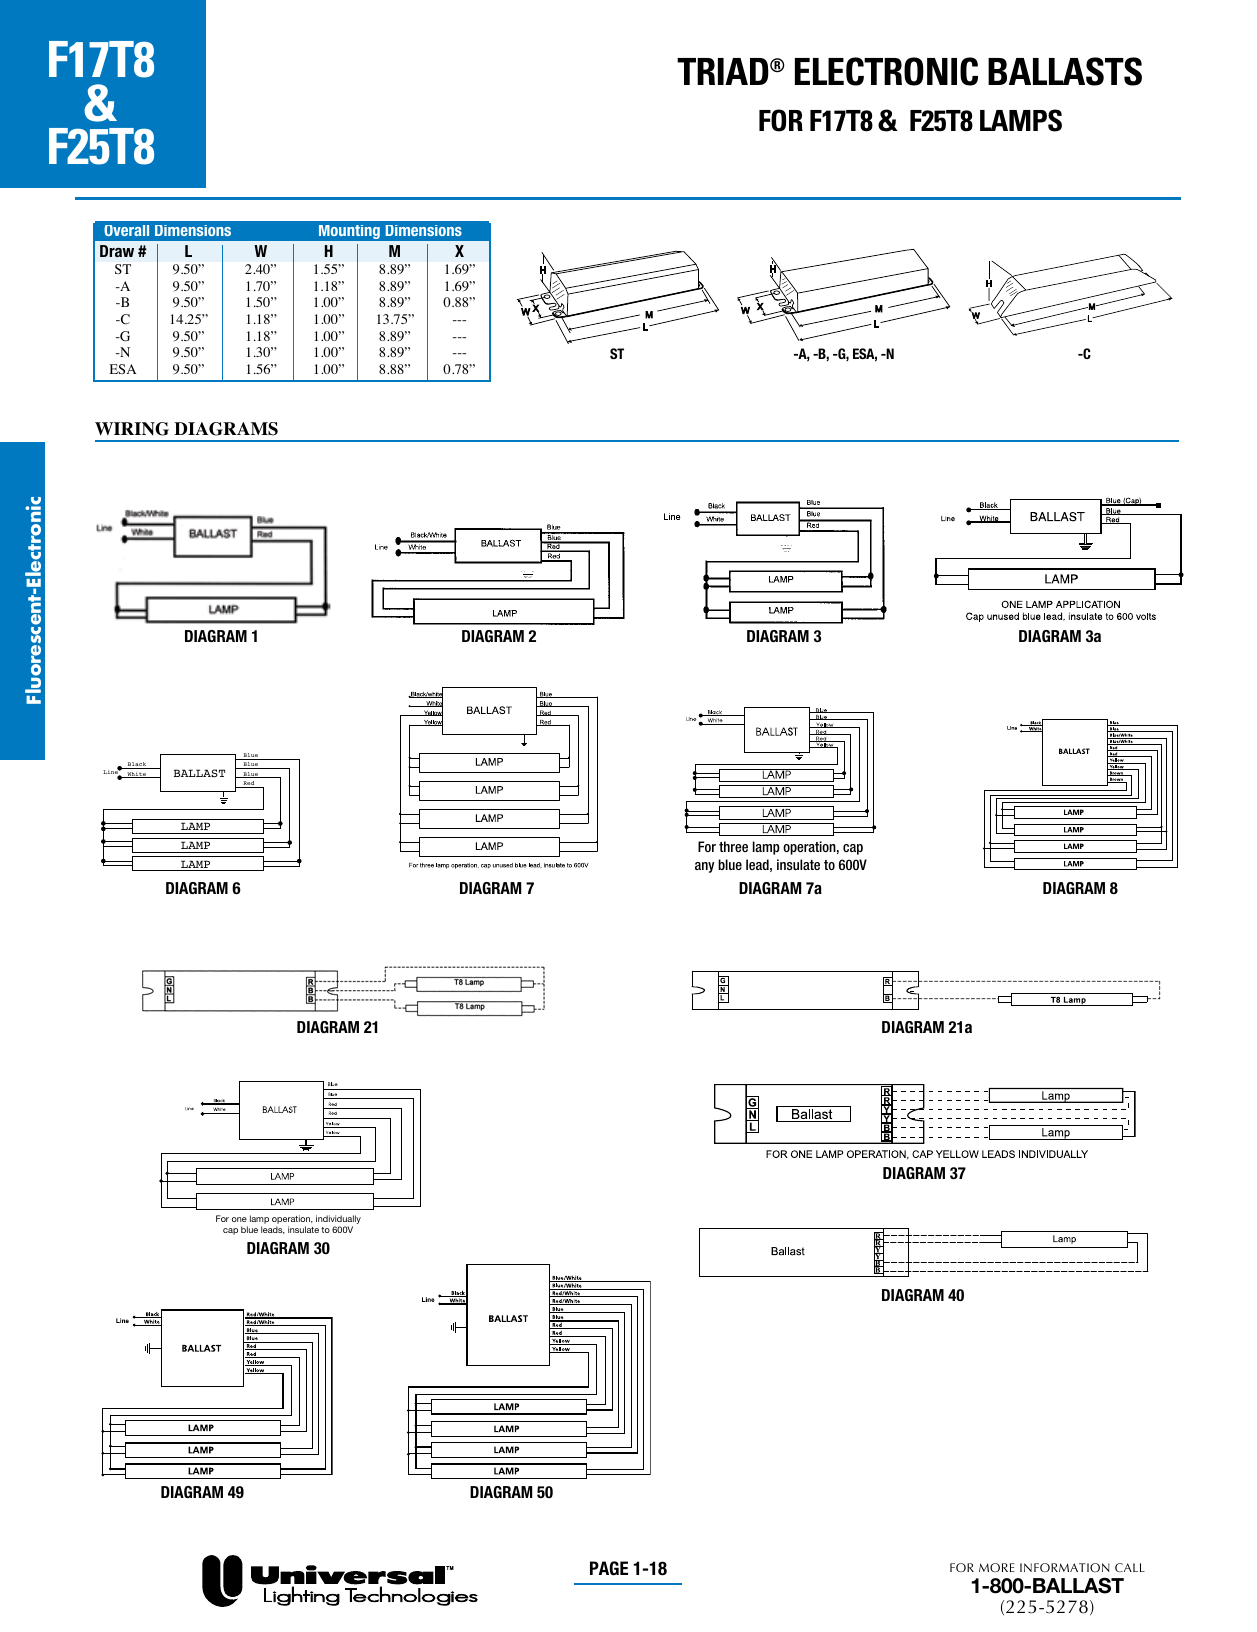 mh400 fixture wiring diagram - Wiring Diagram